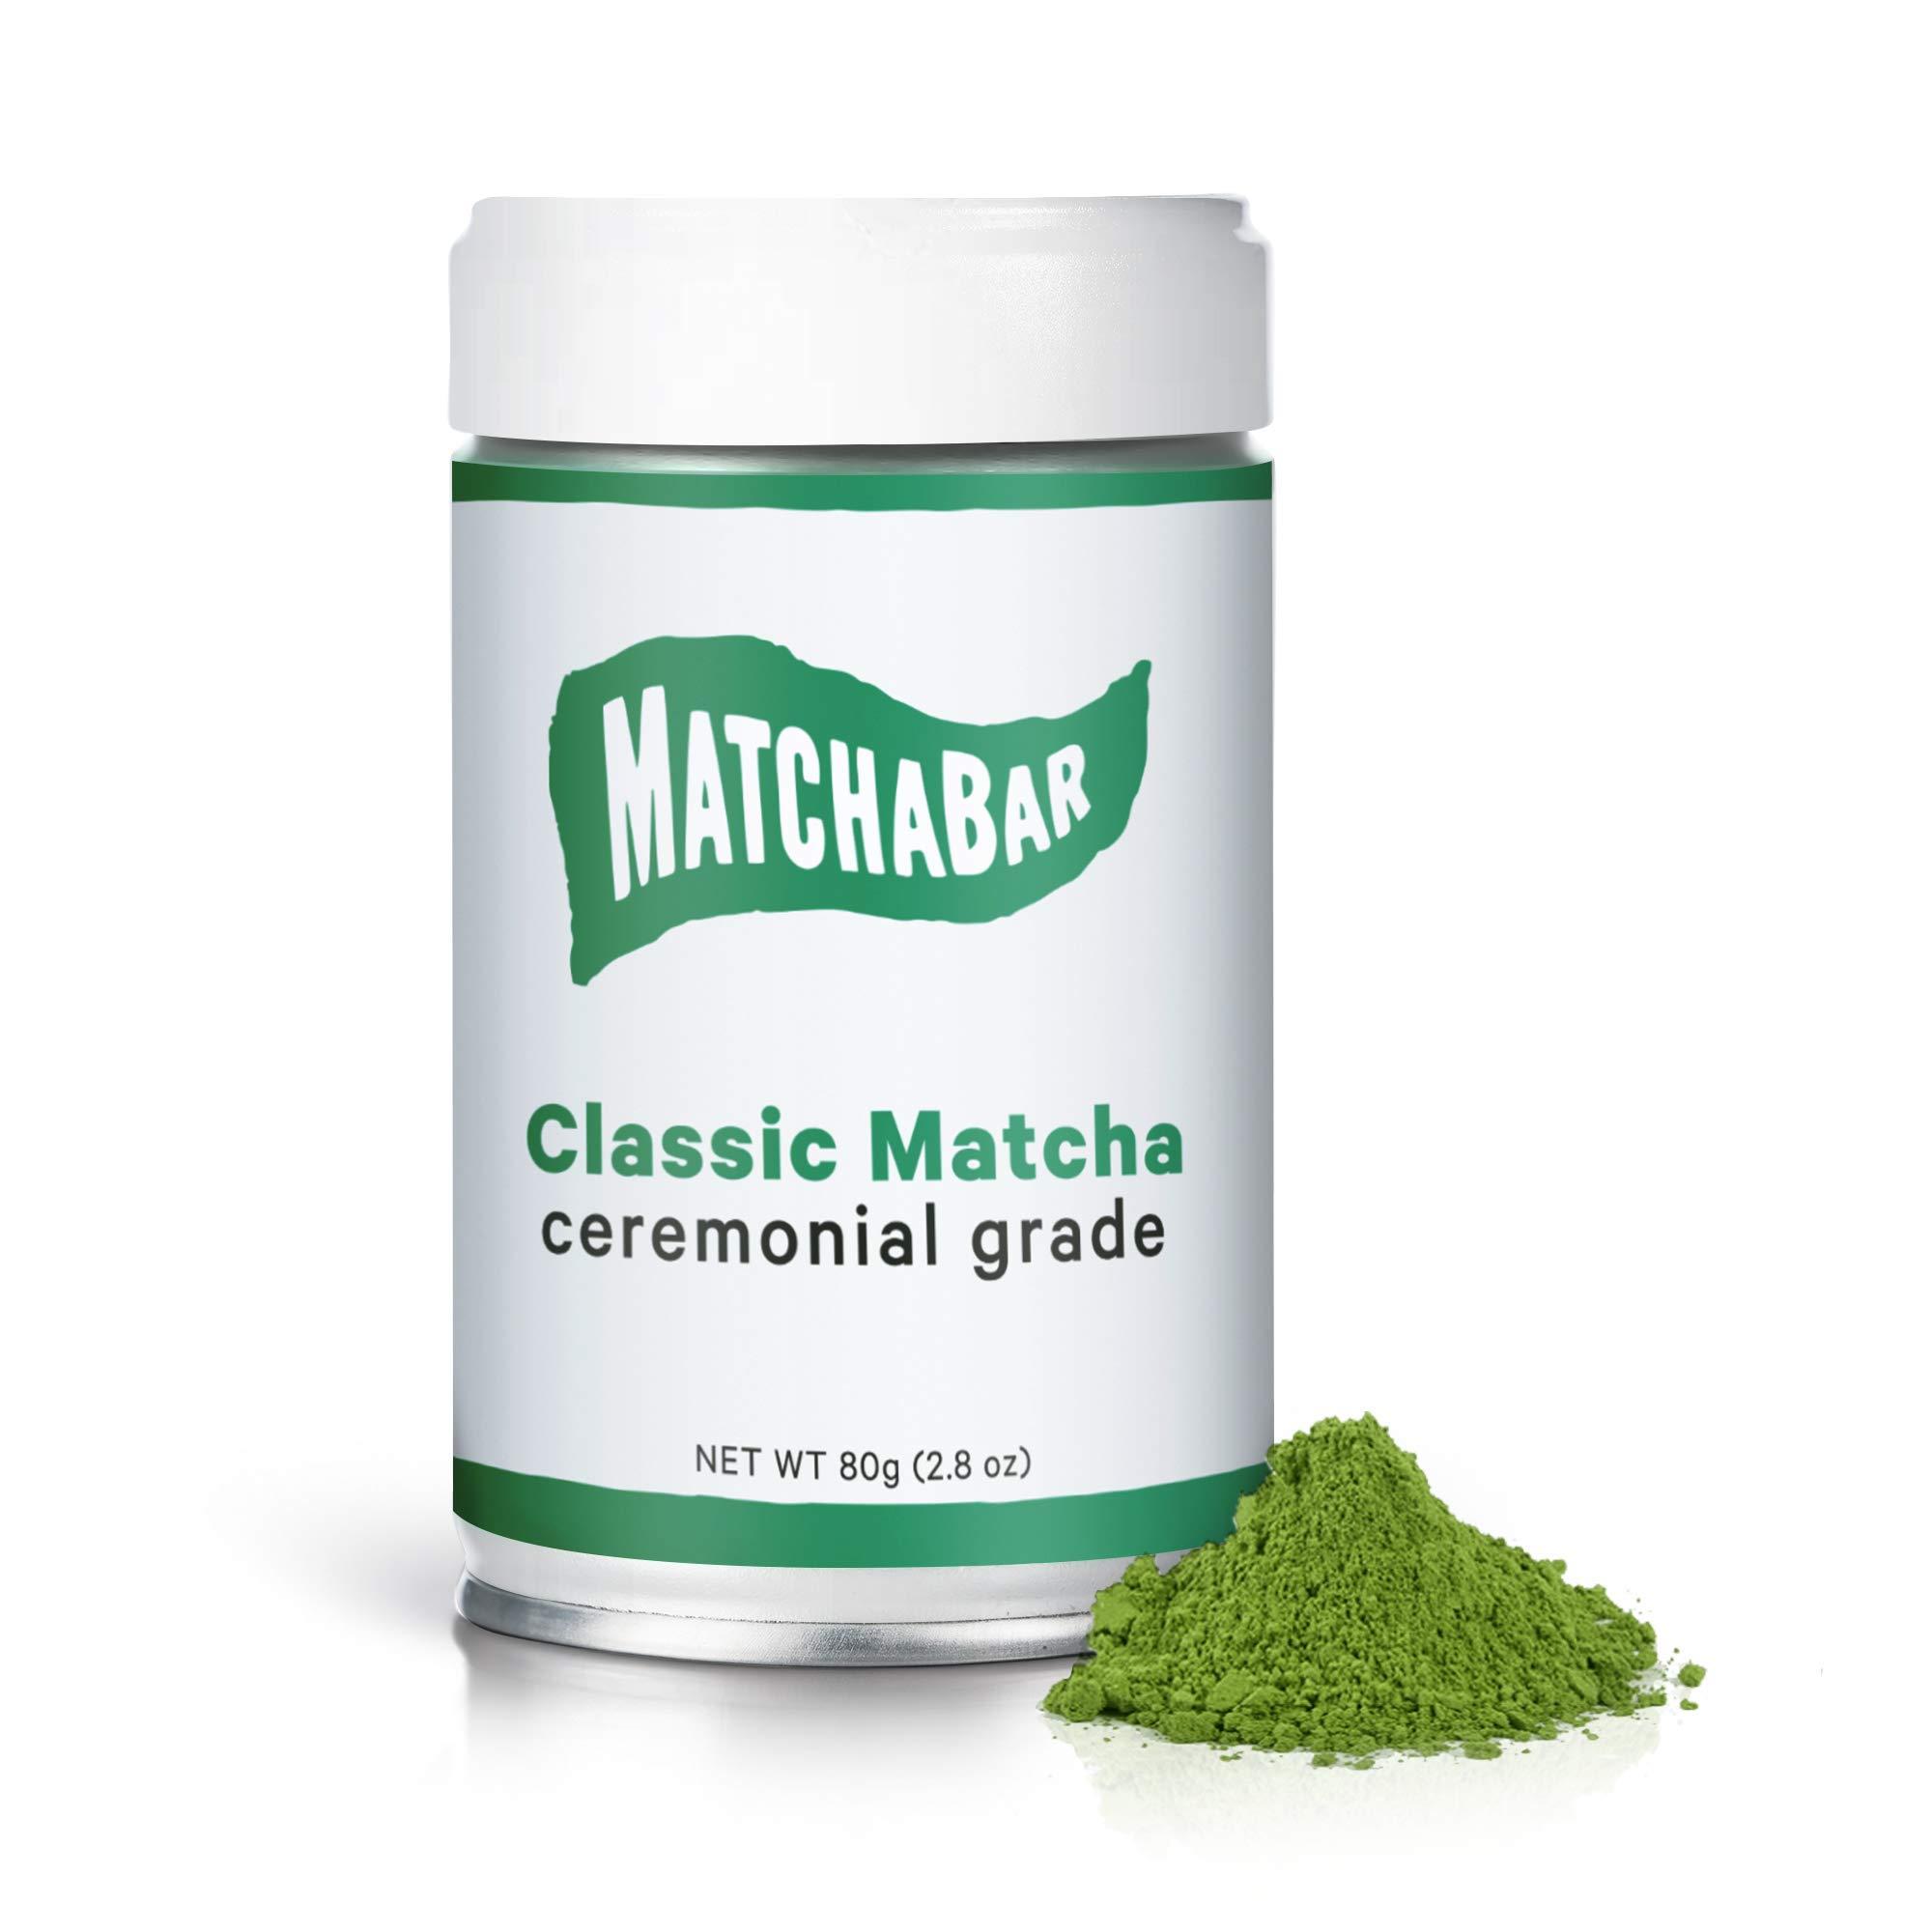 MatchaBar Ceremonial Grade Matcha Green Tea Powder | Premium, First Harvest from Kagoshima, Japan | 80g Tin = 40 Servings